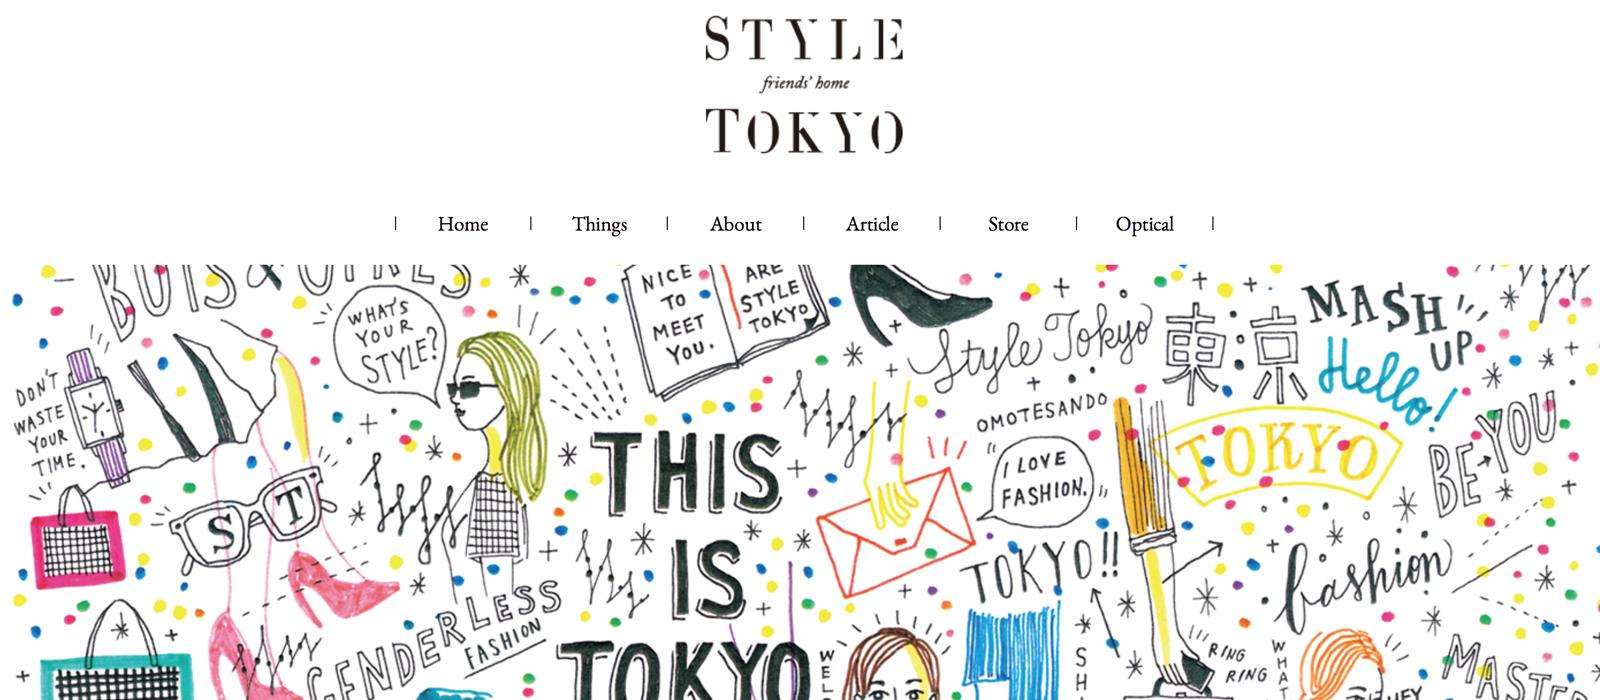 STYLE TOKYO WEBSITE